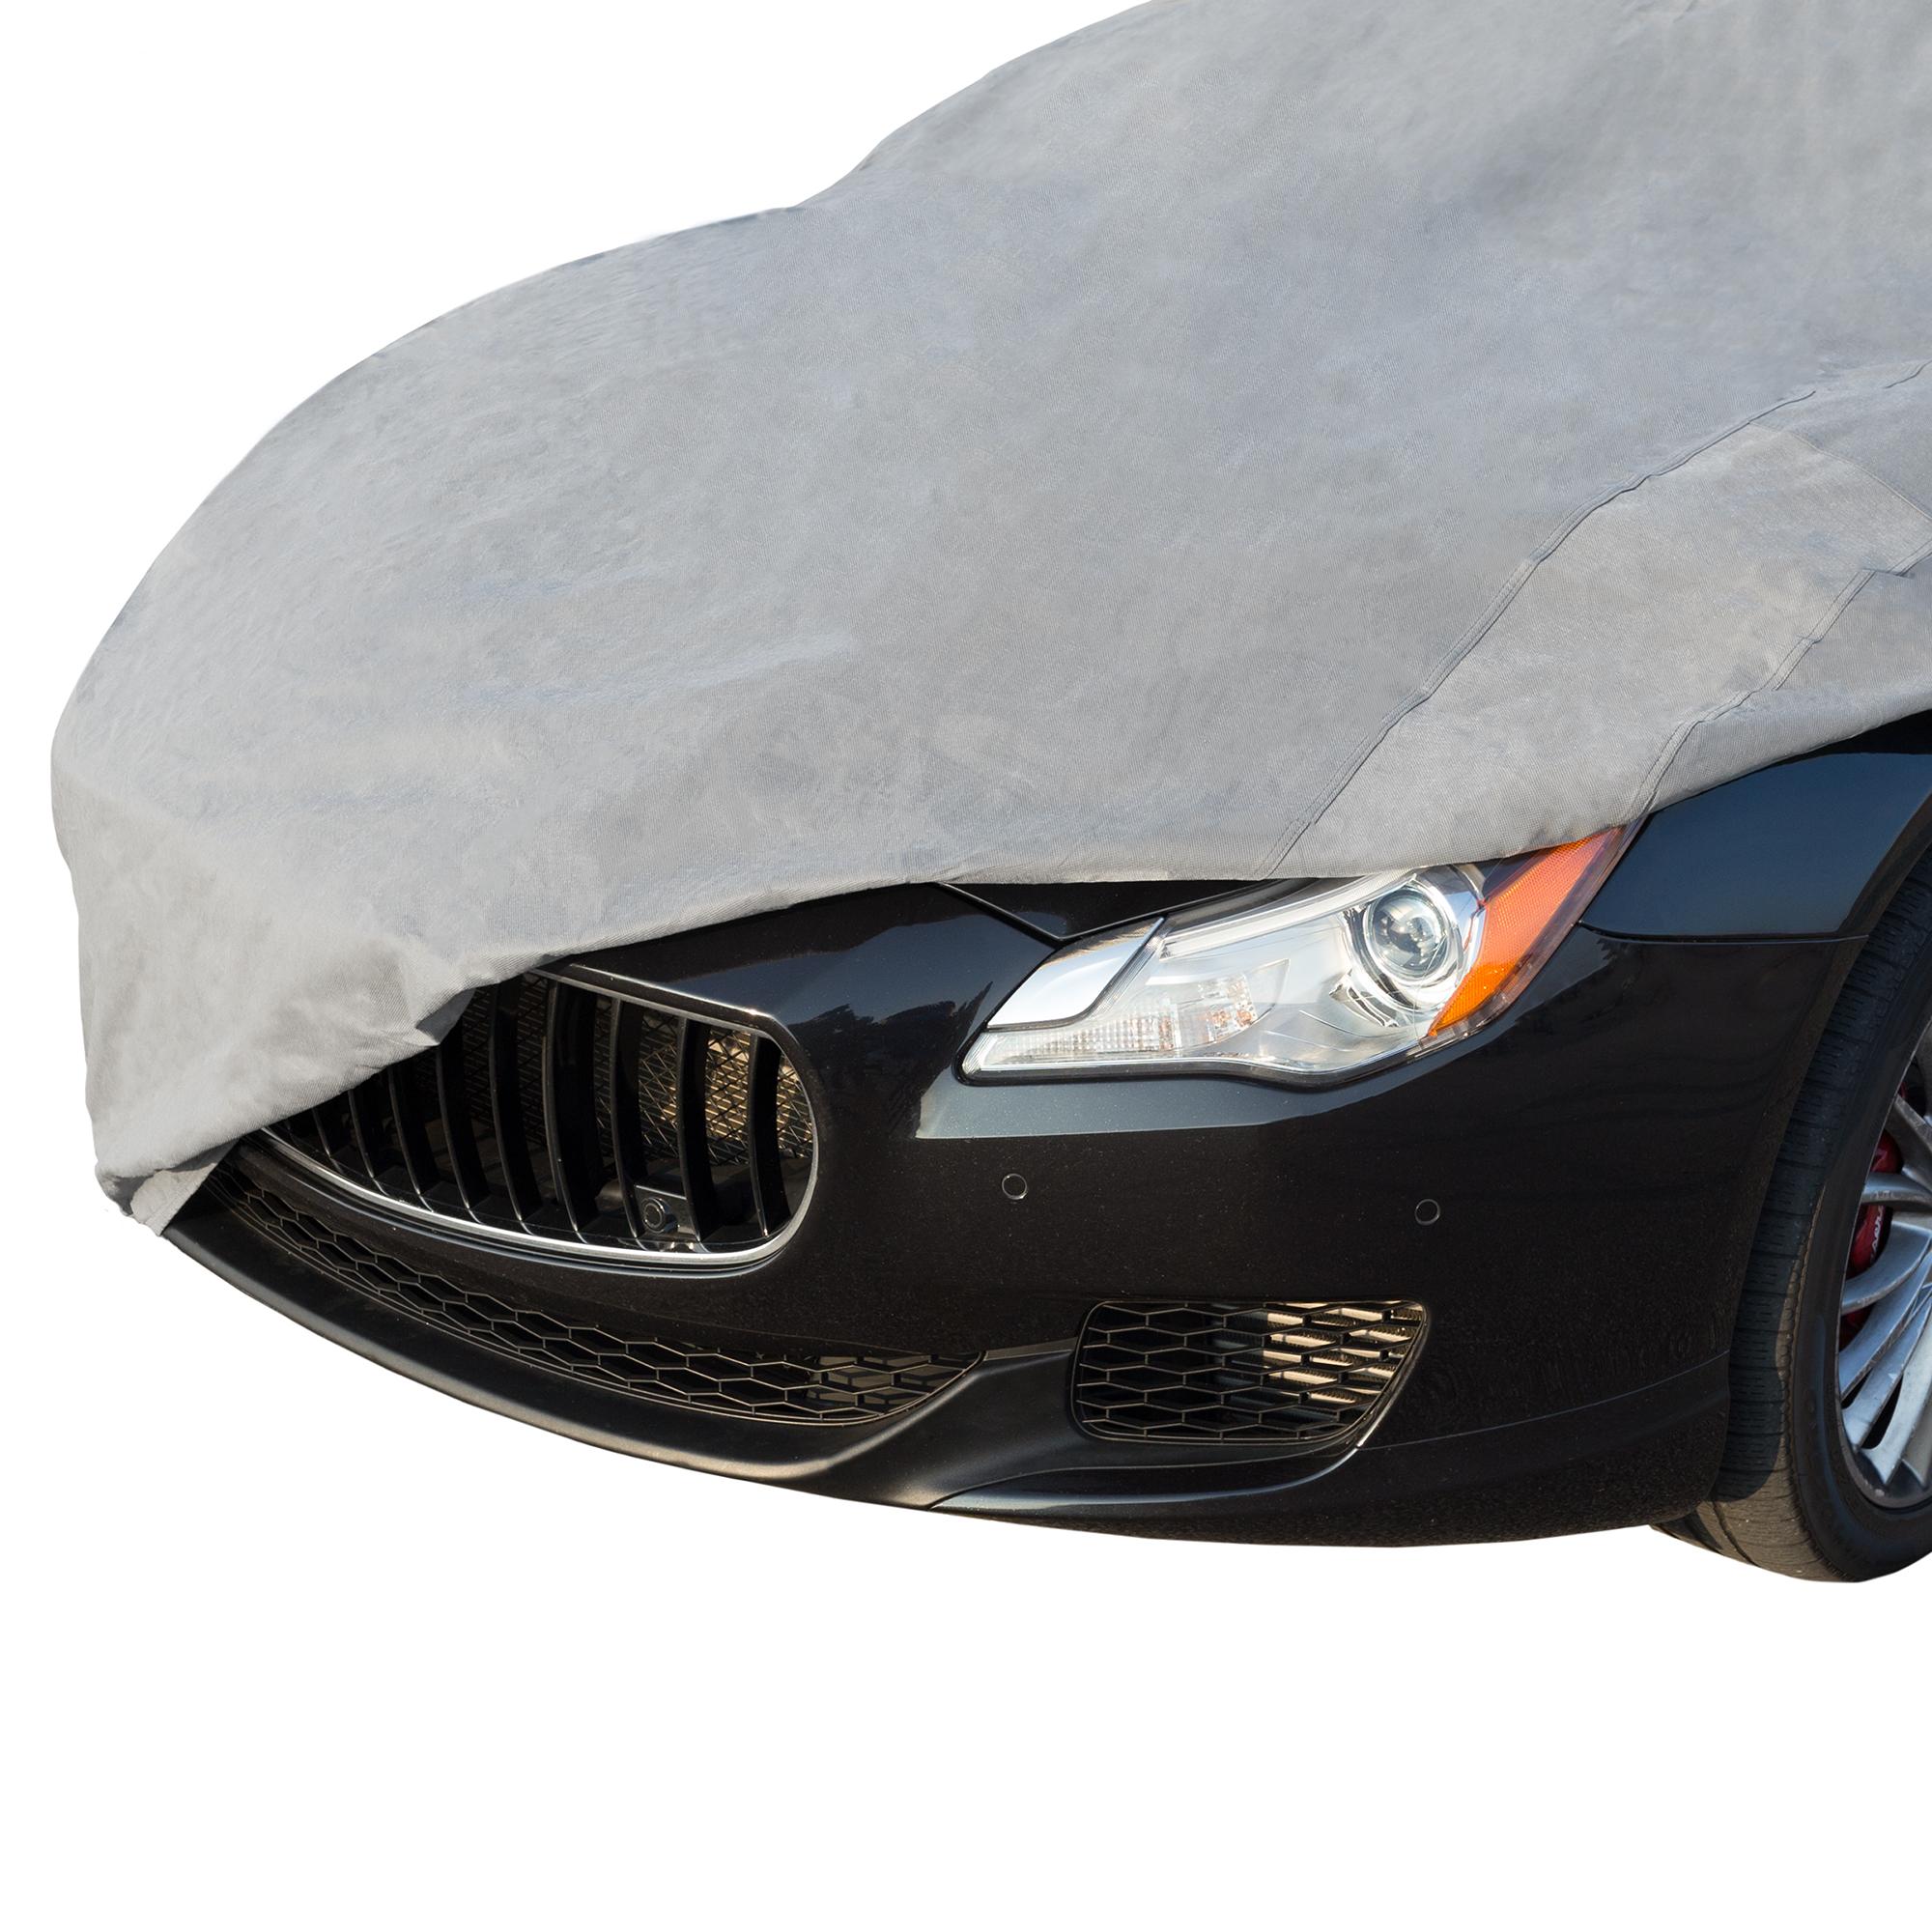 460X165X120 CM WATERPROOF OUTDOOR//INDOOR AUTO CAR SOFT COTTON COVER